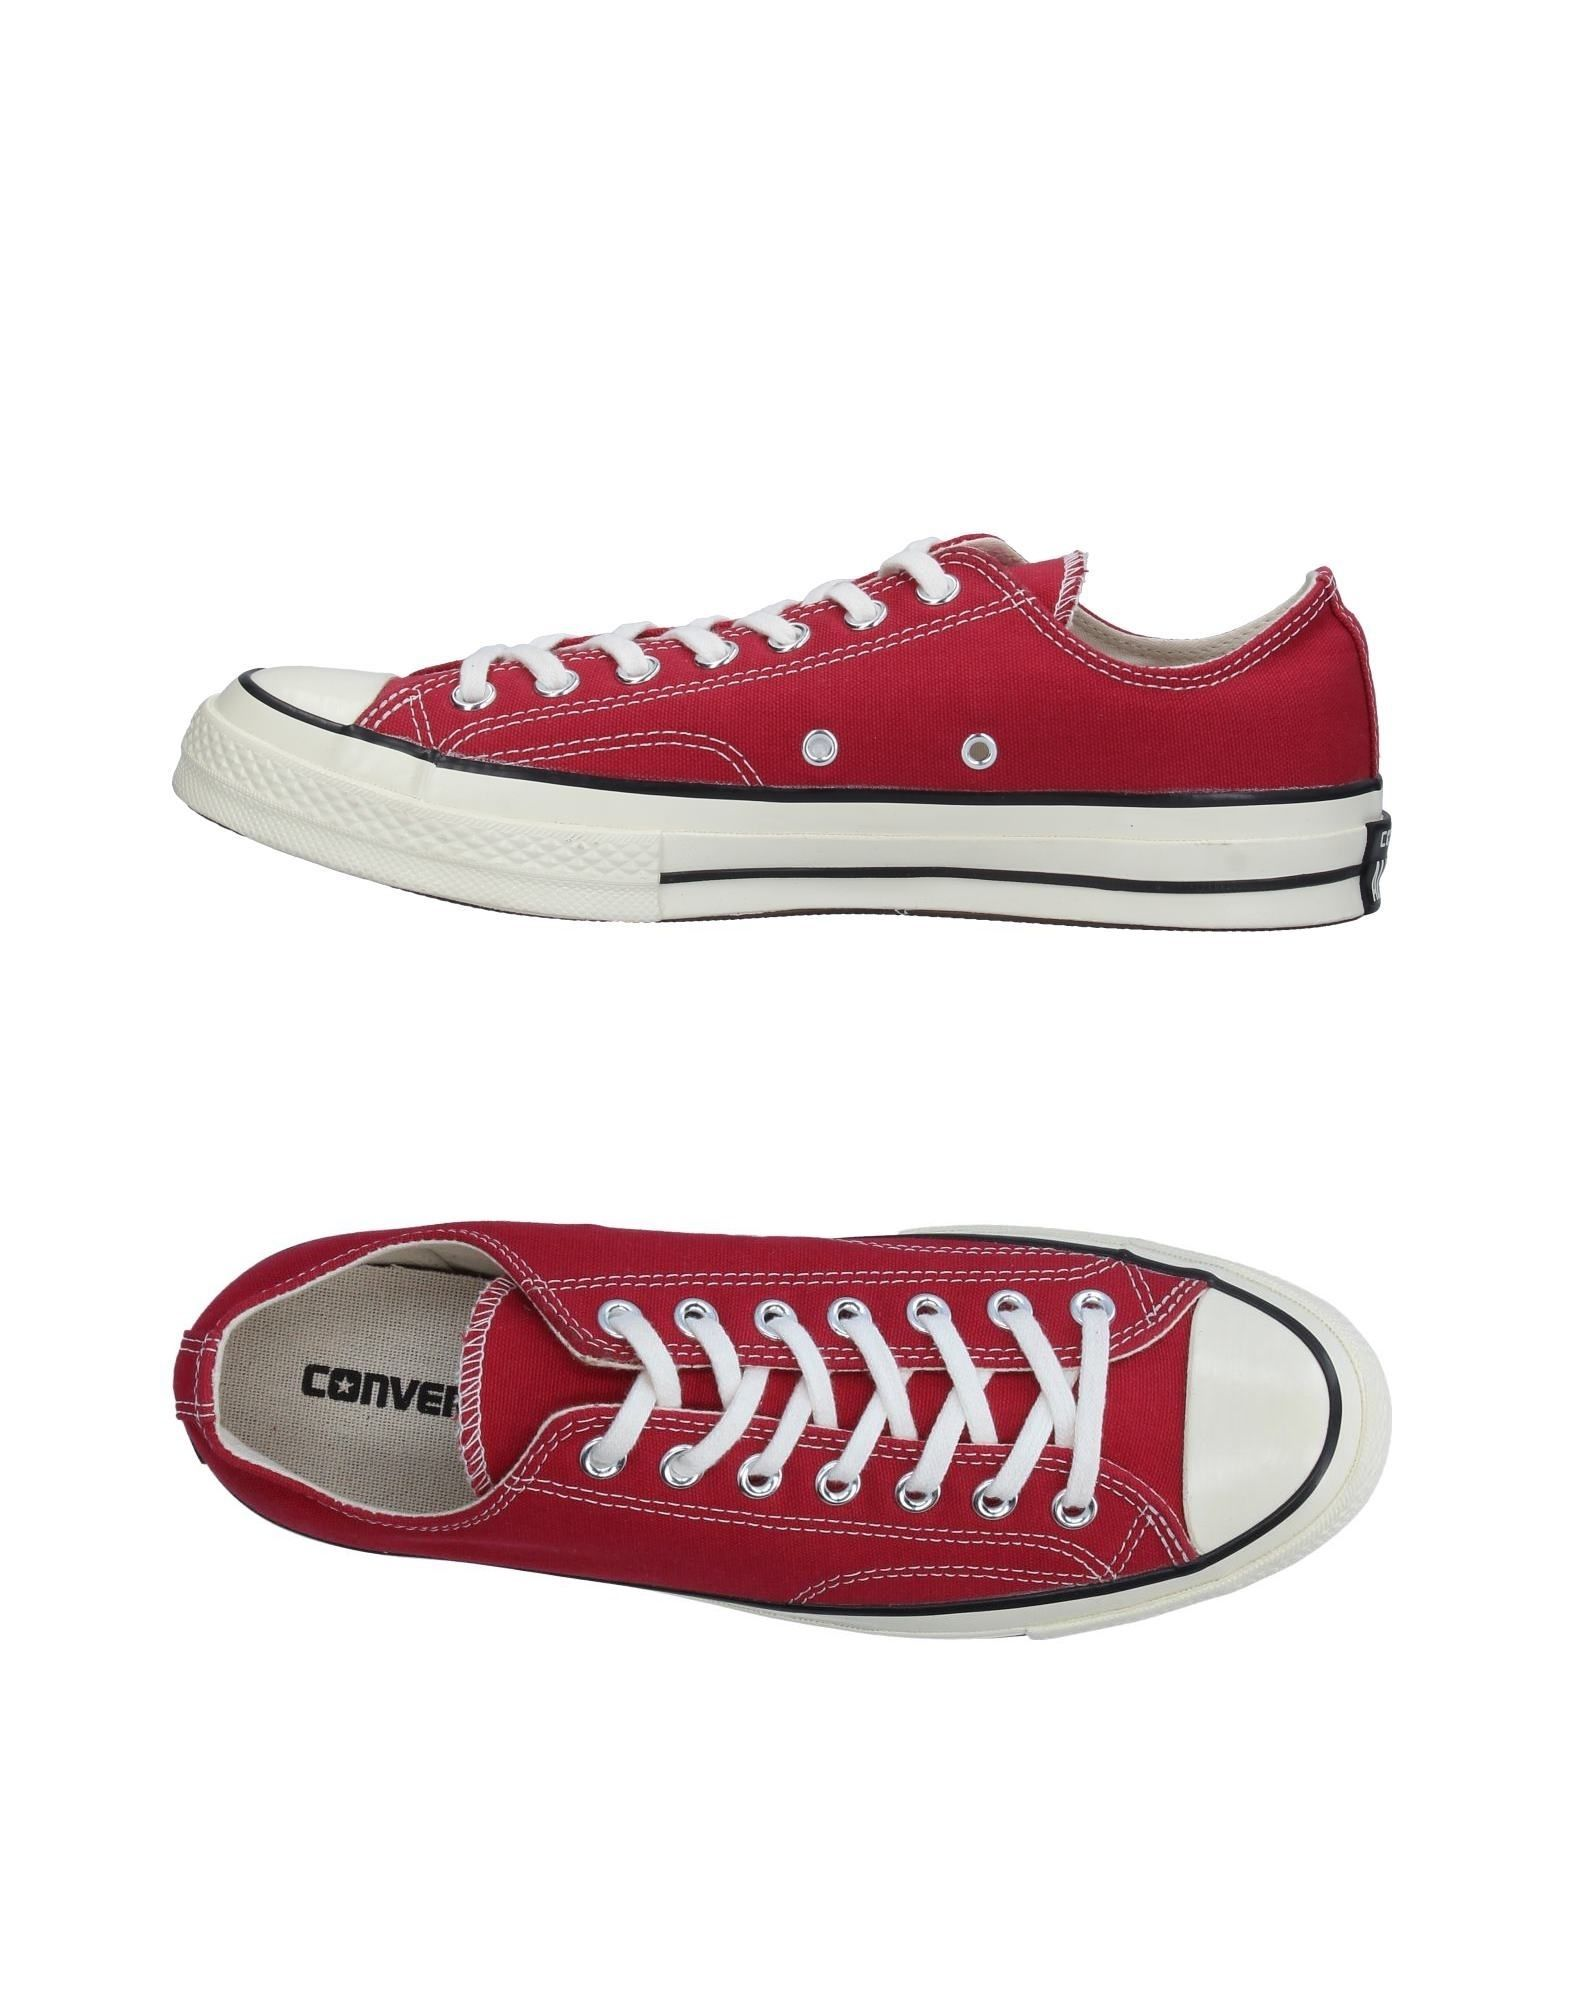 Converse All Star Sneakers Herren  11329696GG Neue Schuhe